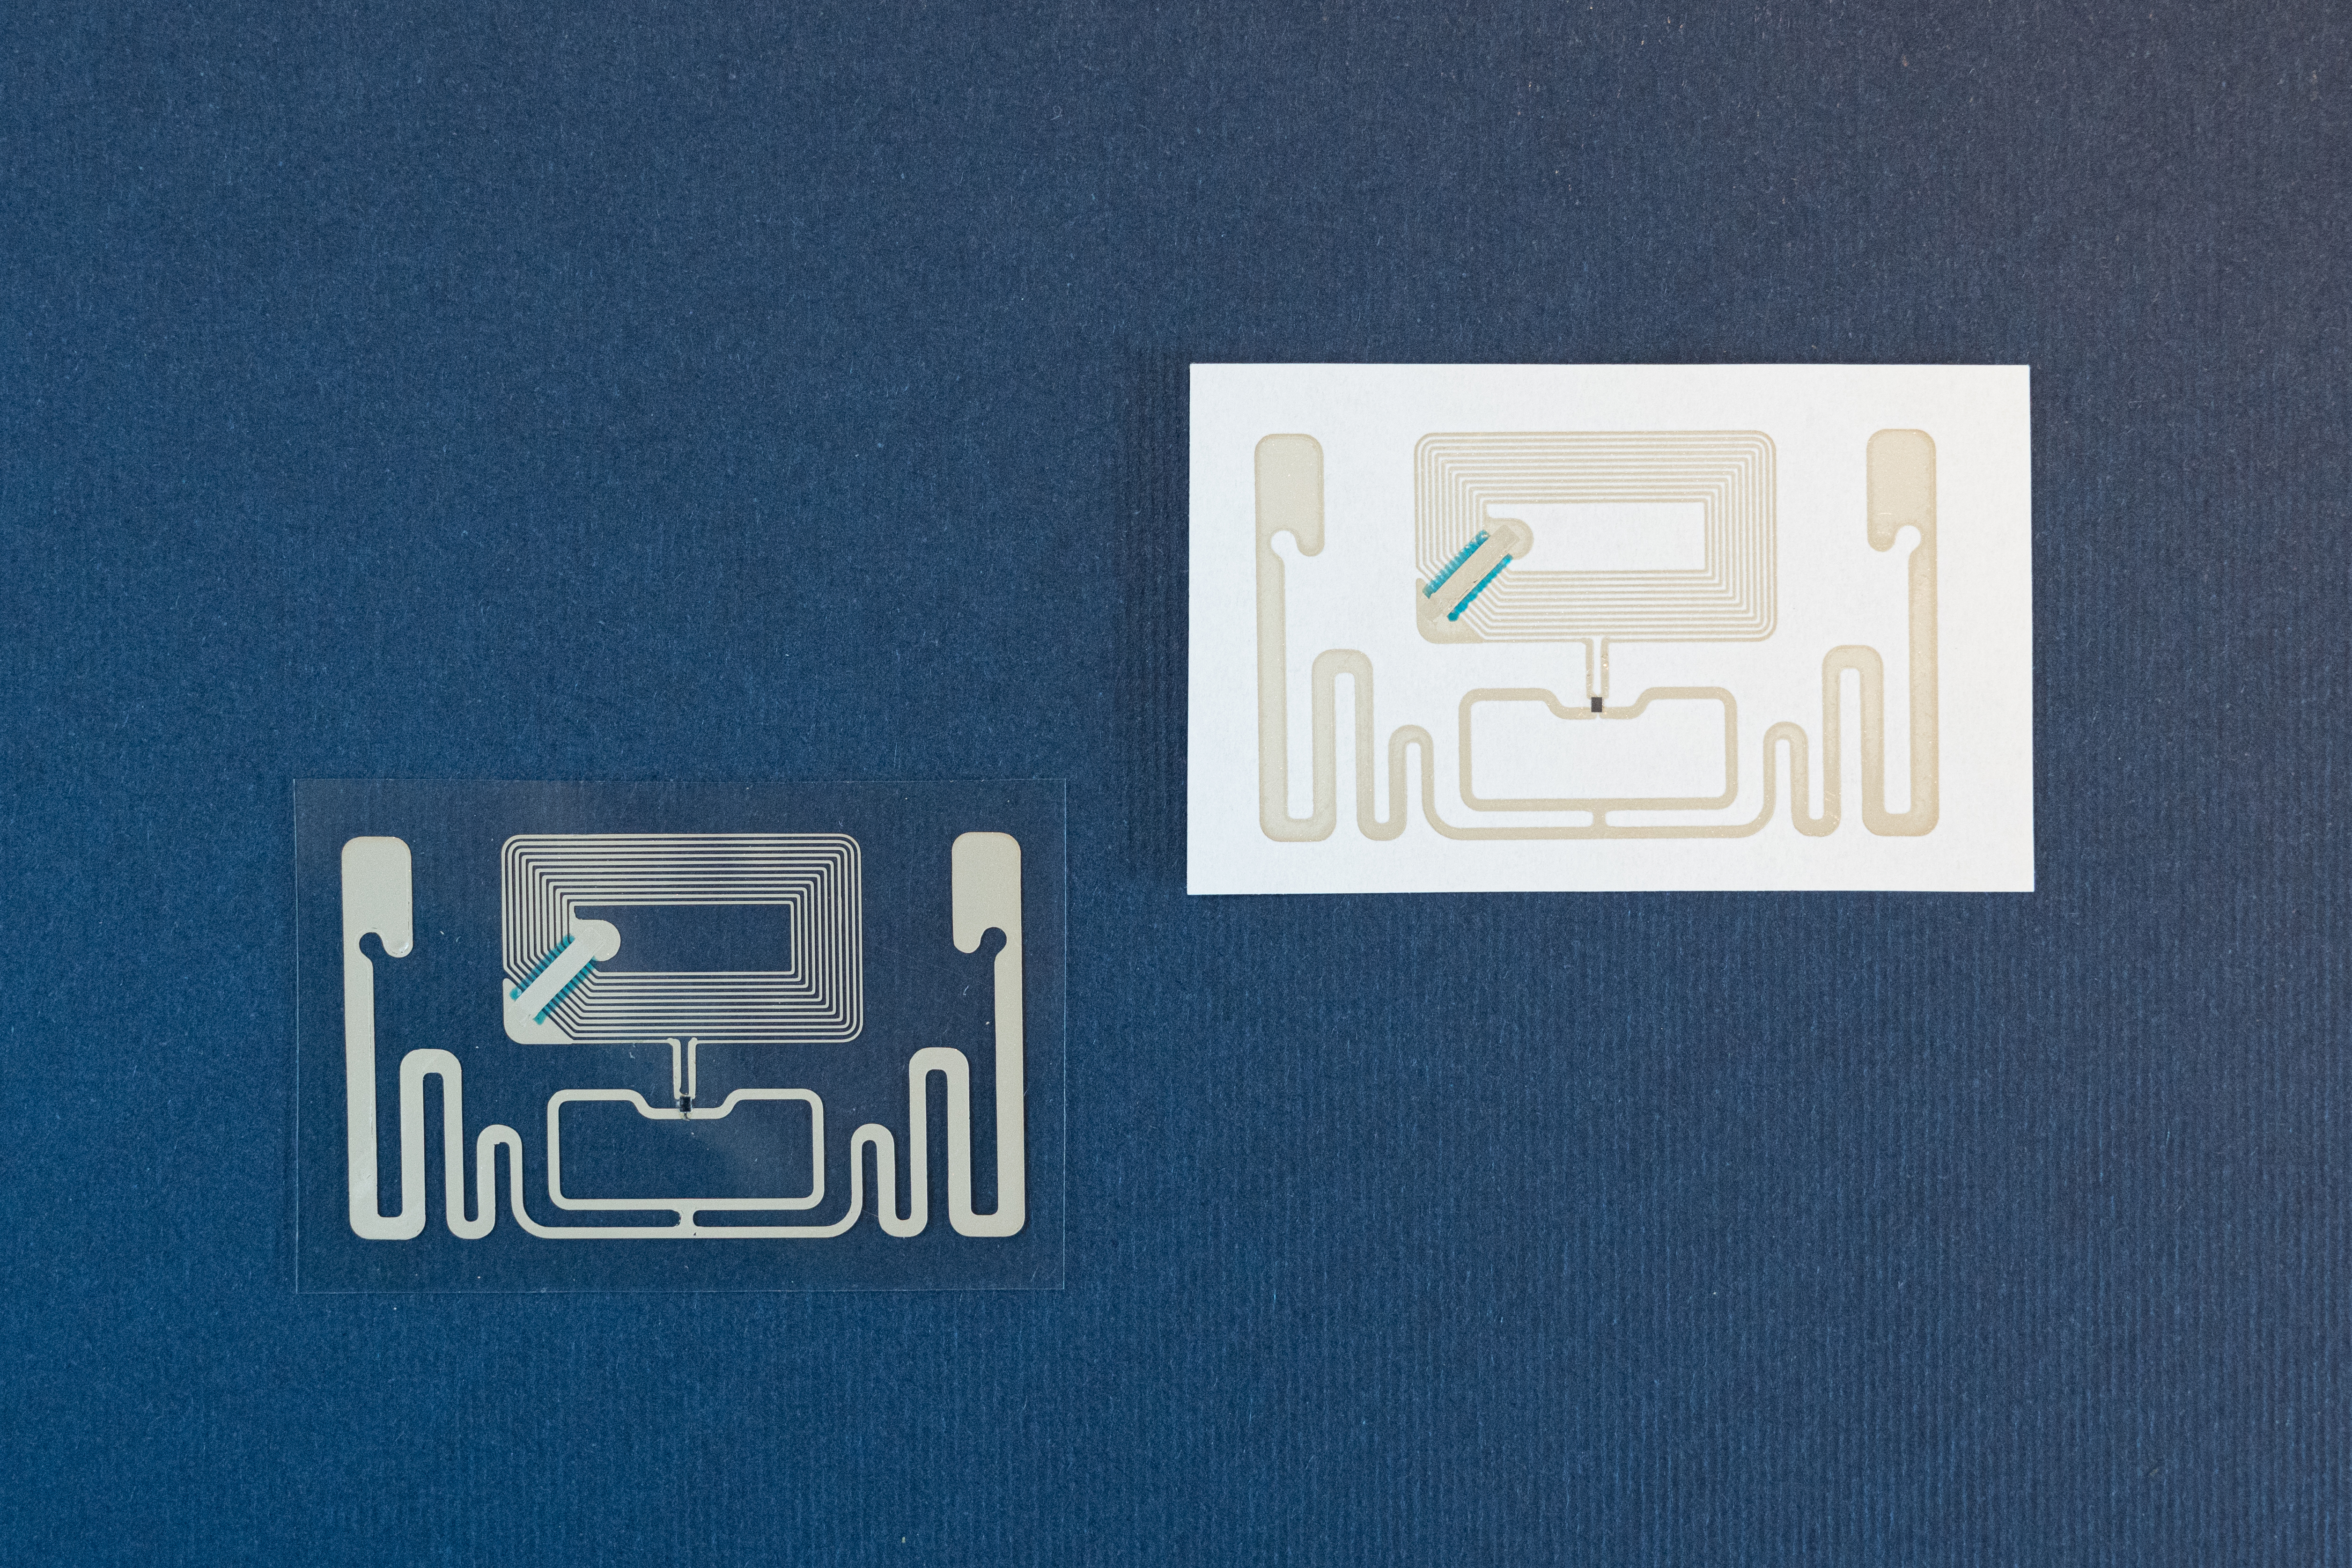 NFC, UHF and HF RFID eco-friendly antennas